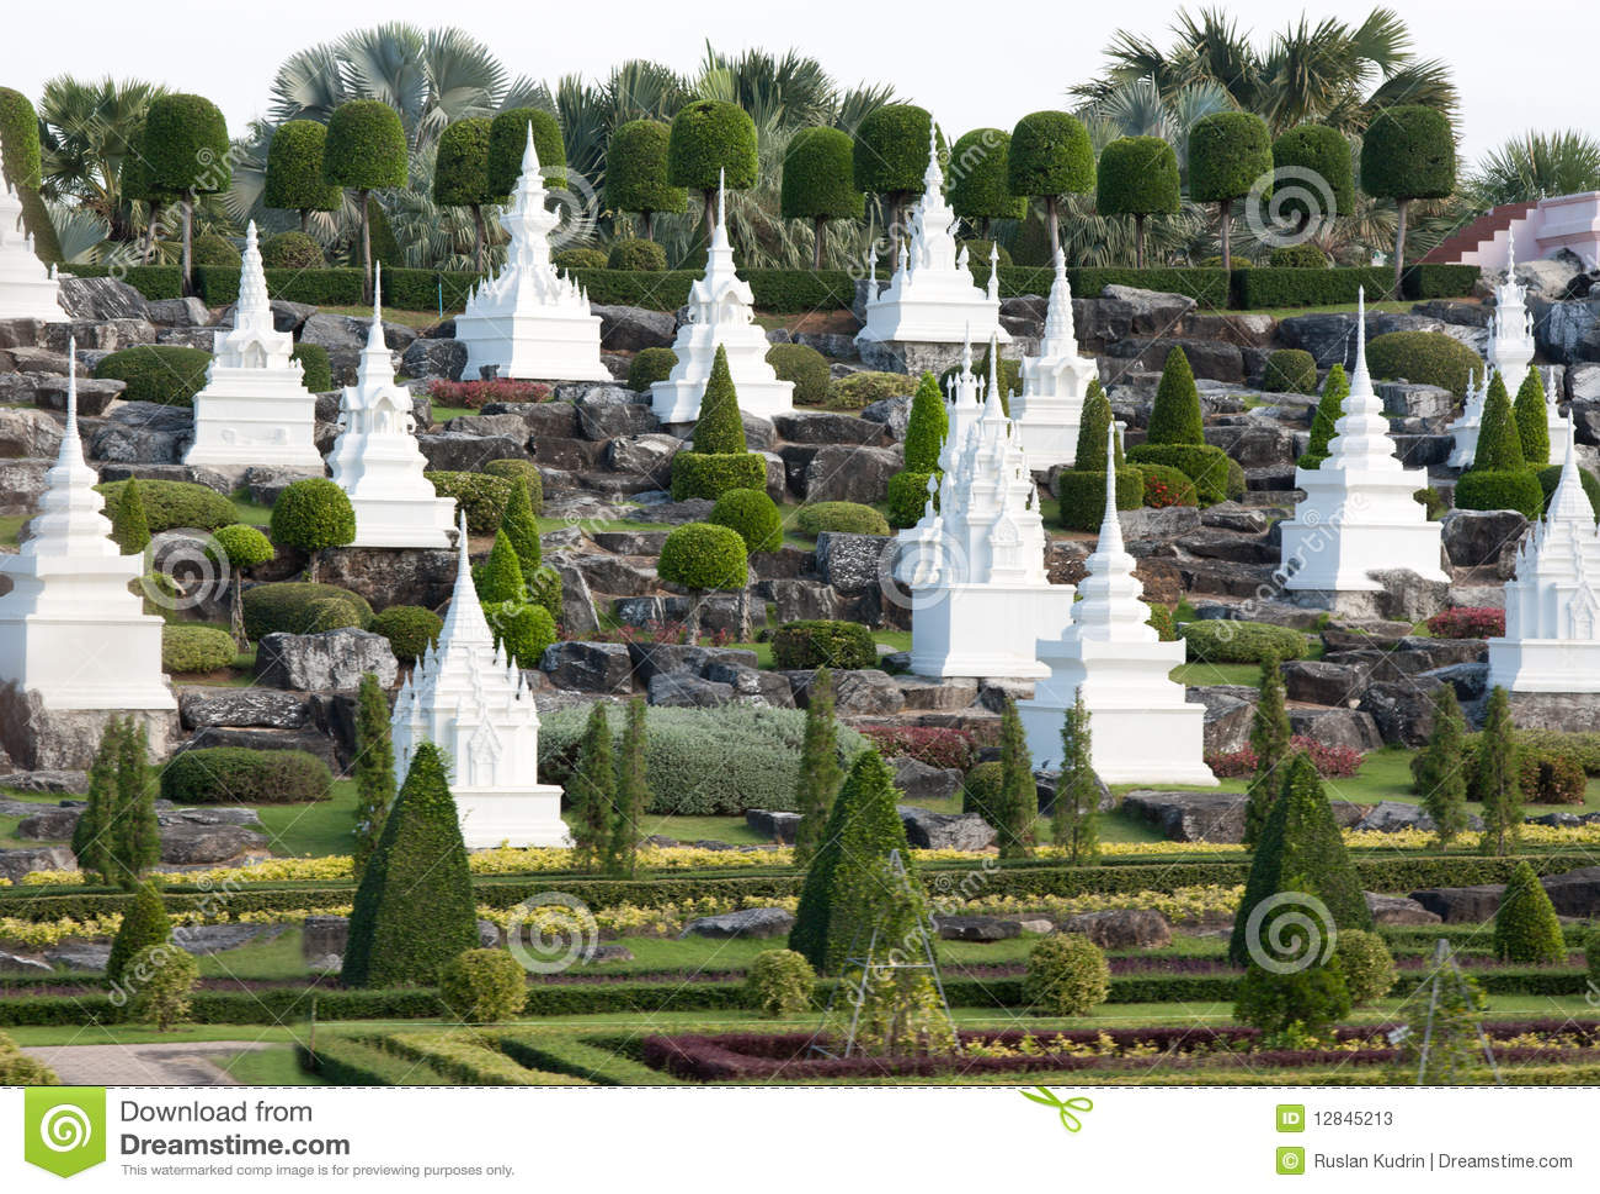 Giardini francesi nel giardino di nongnooch immagine stock for Giardini francesi